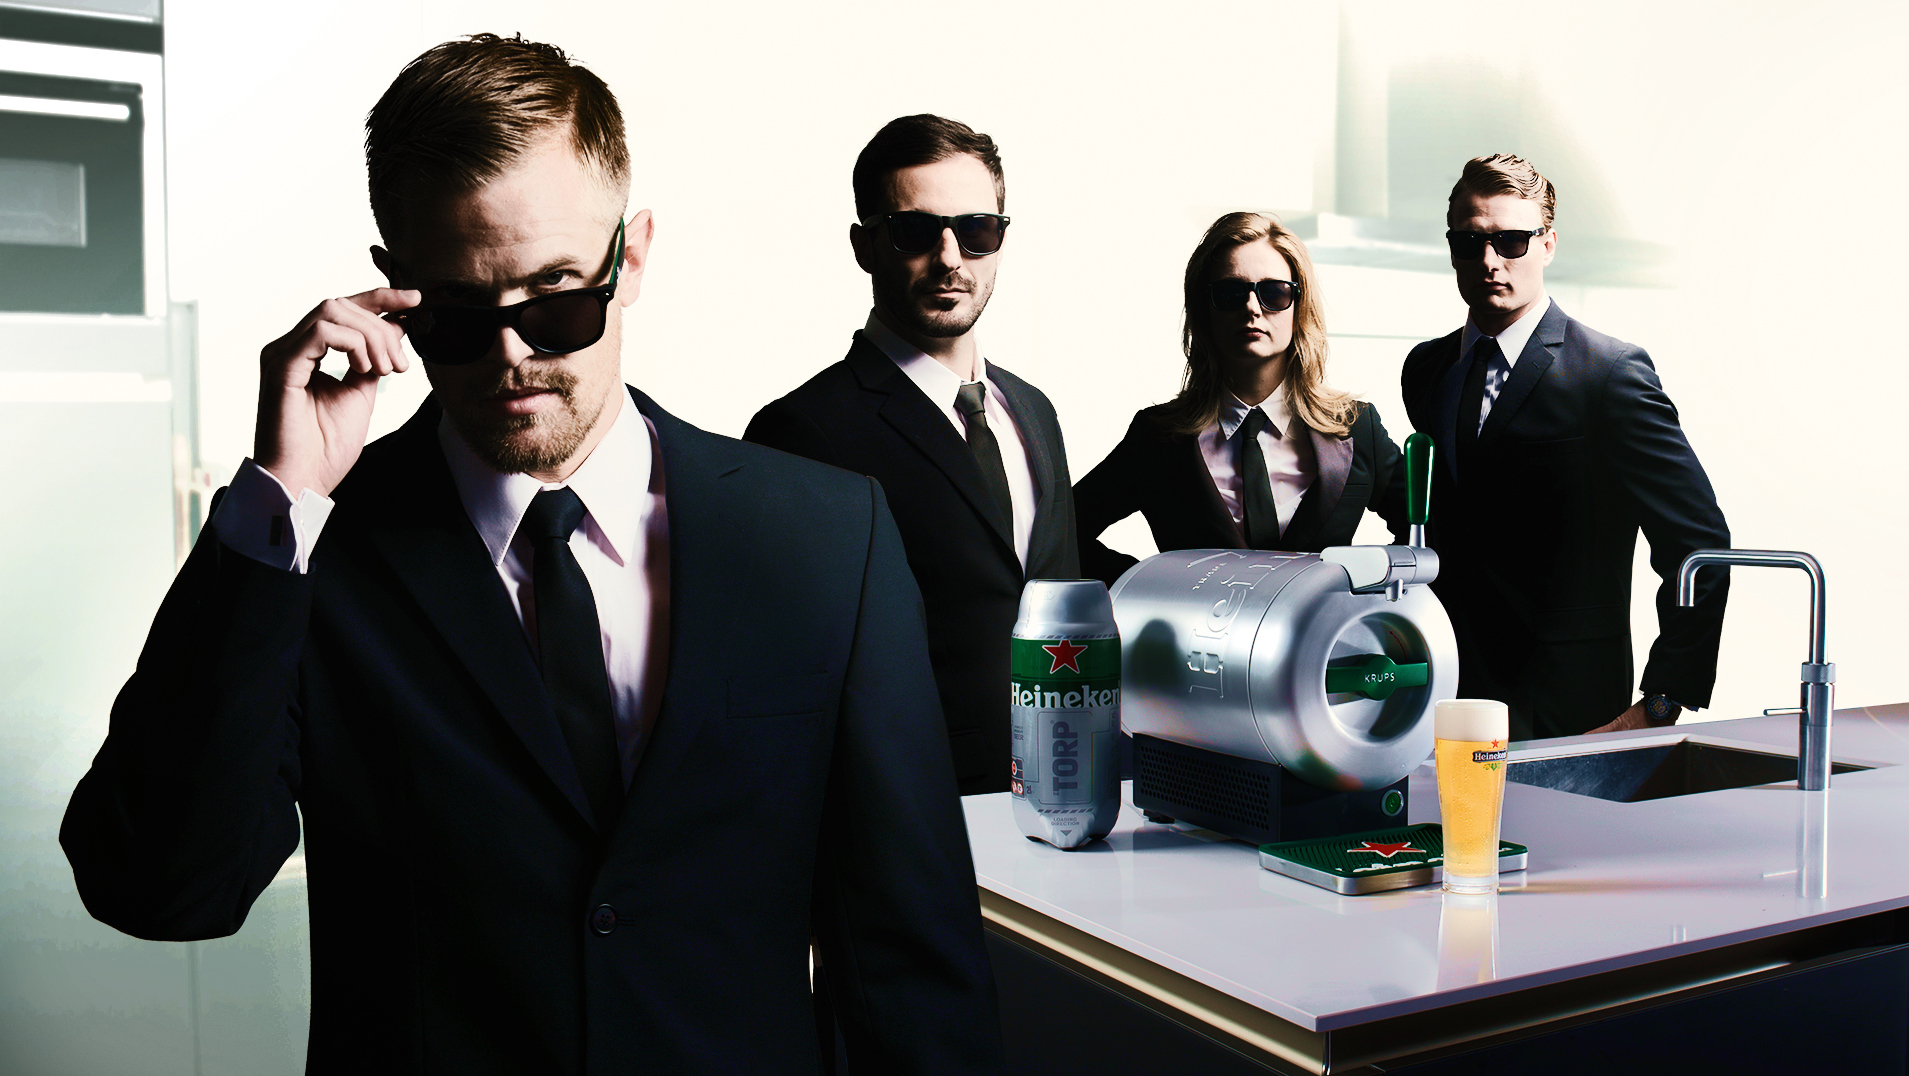 Heineken 2015